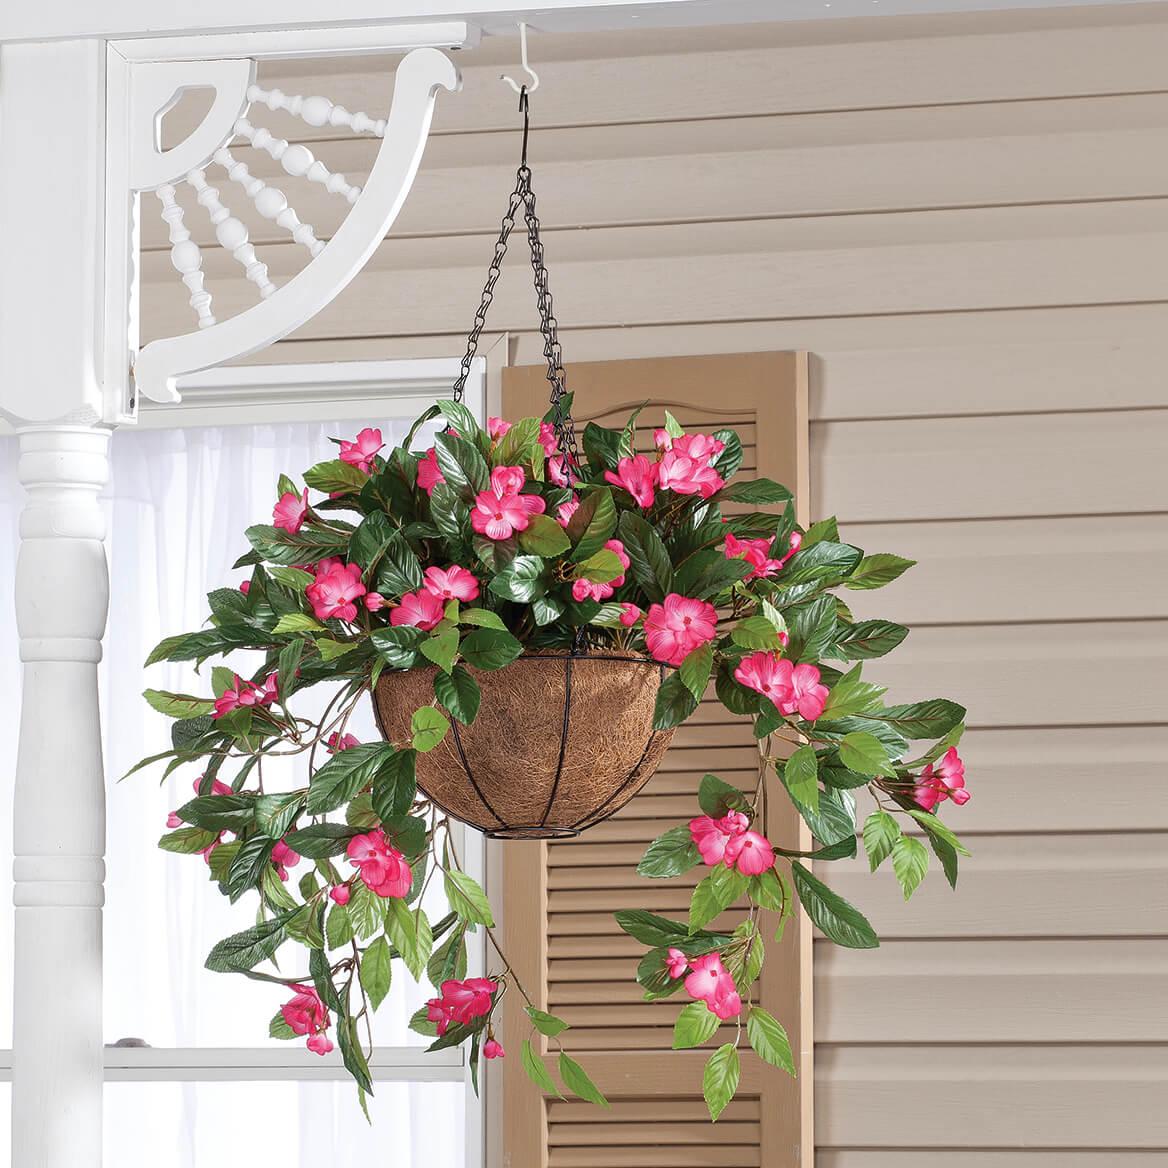 Fully Assembled Impatiens Hanging Basket by OakRidge™-355017